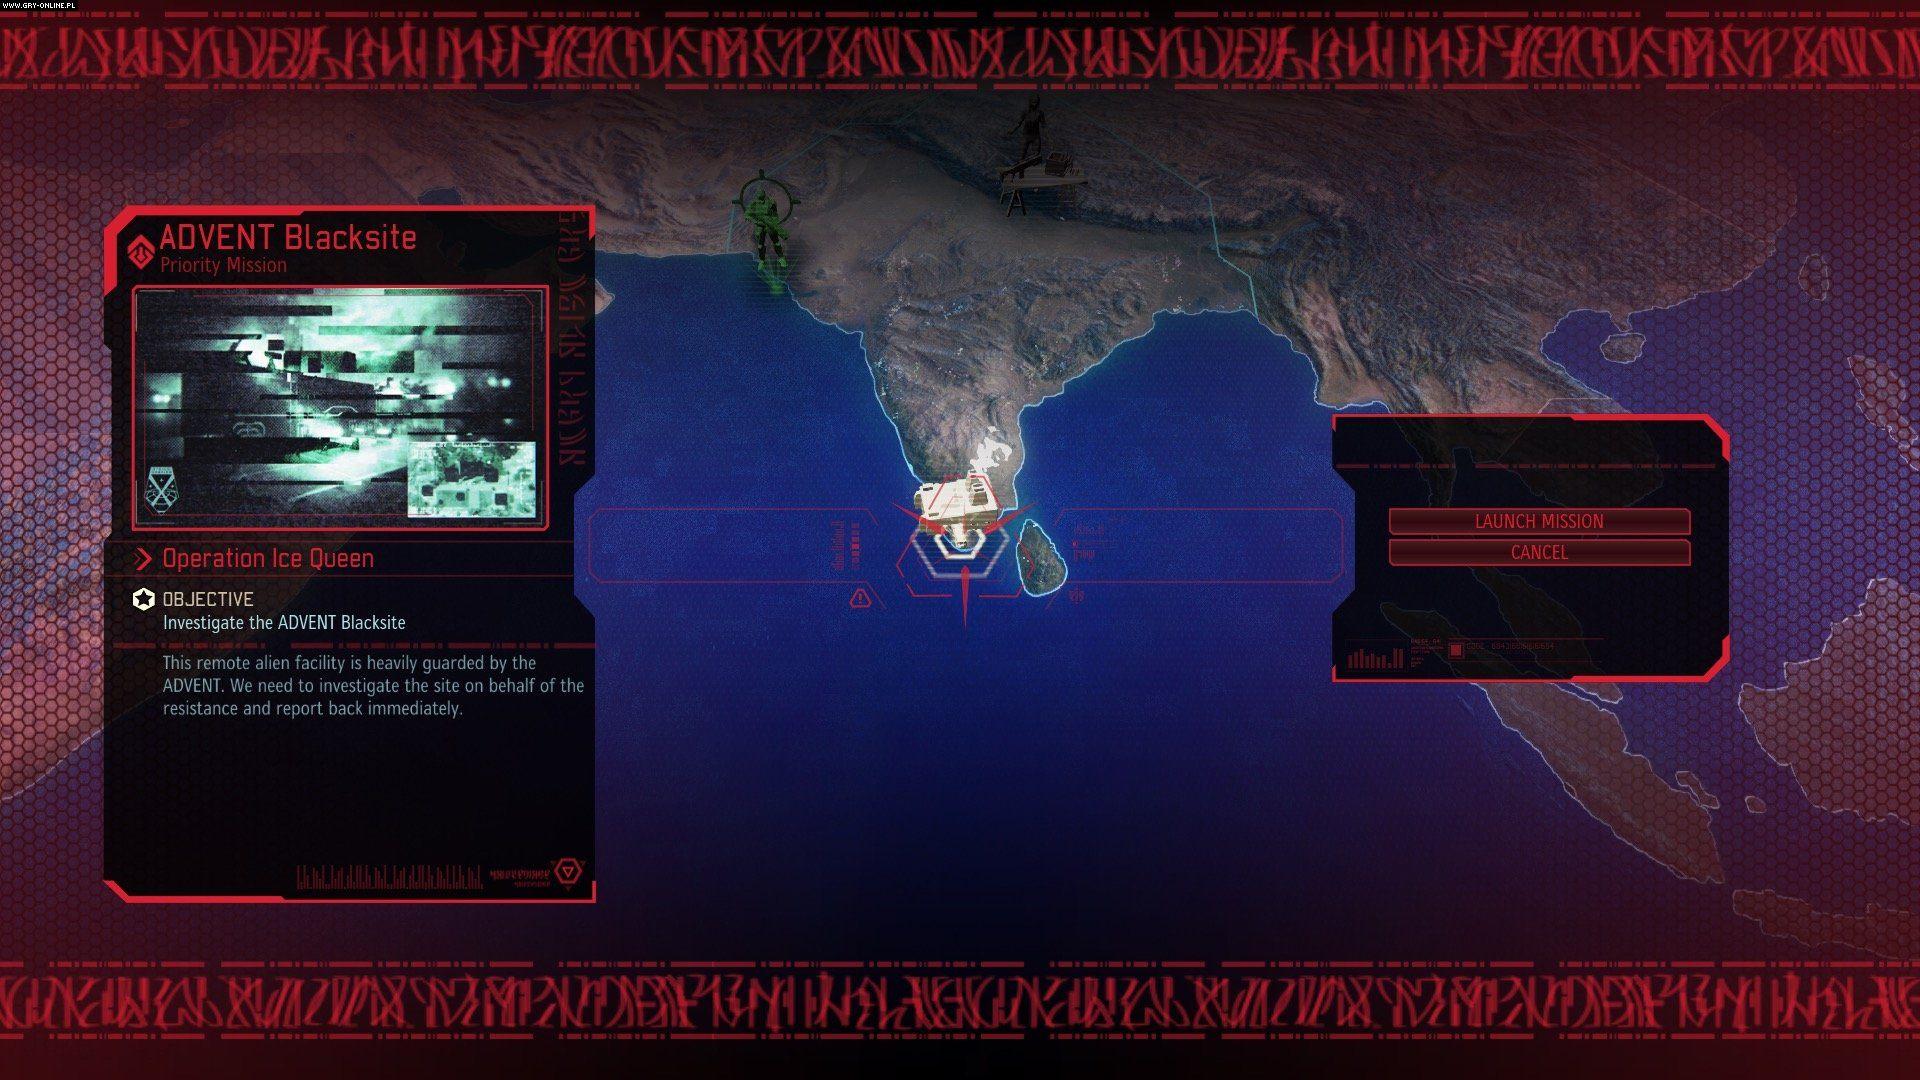 XCOM2 image #6